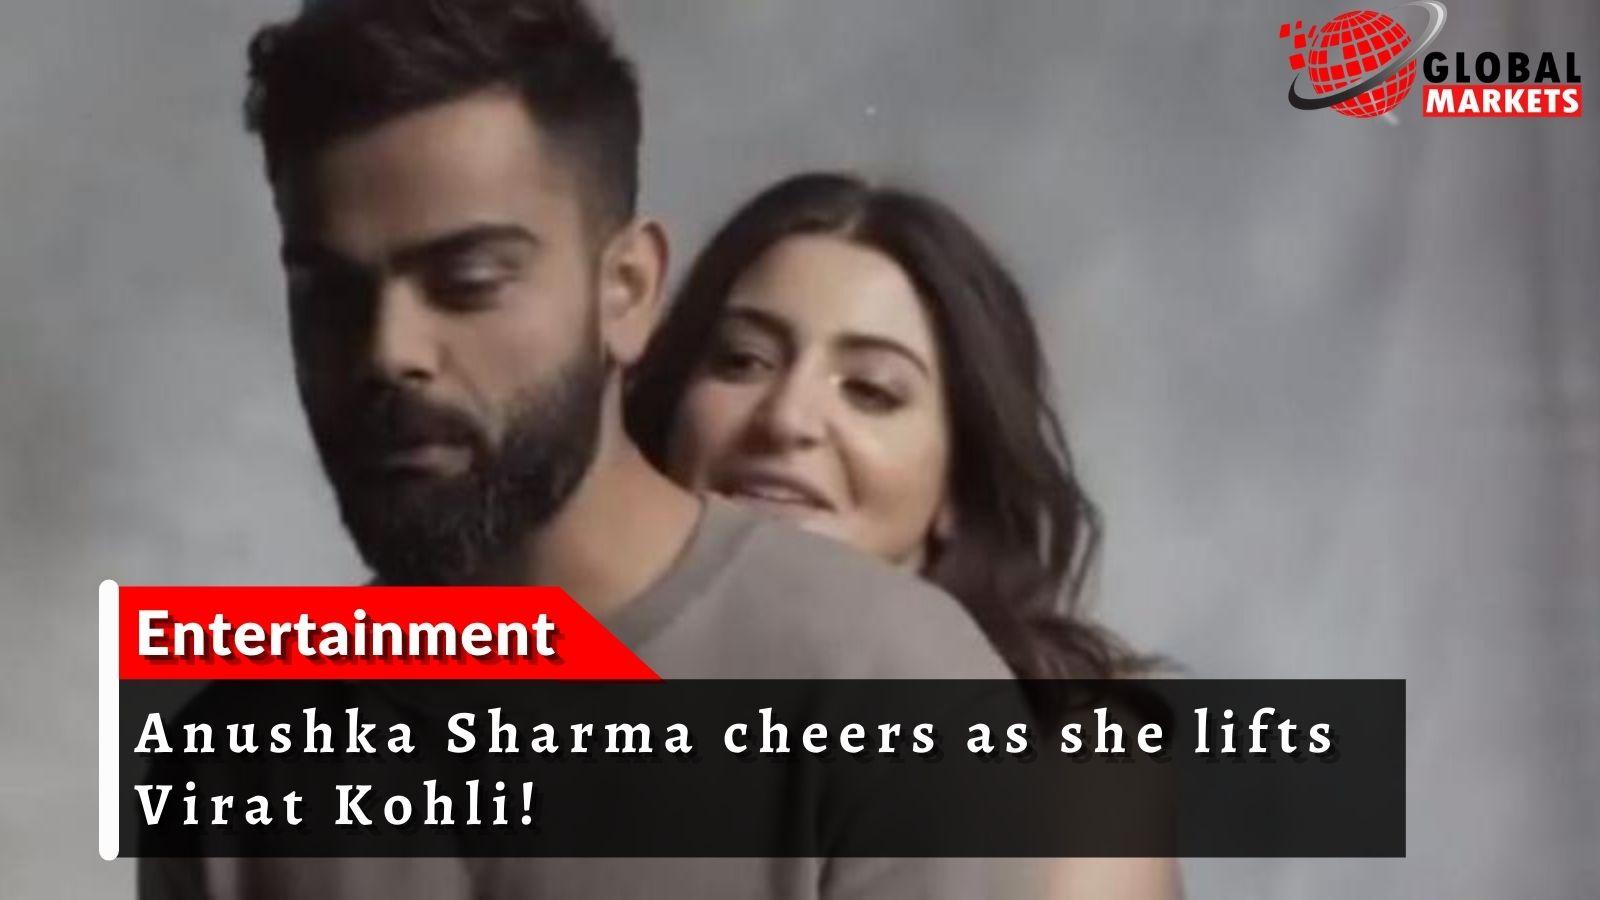 Anushka Sharma cheers as she lifts Virat Kohli!